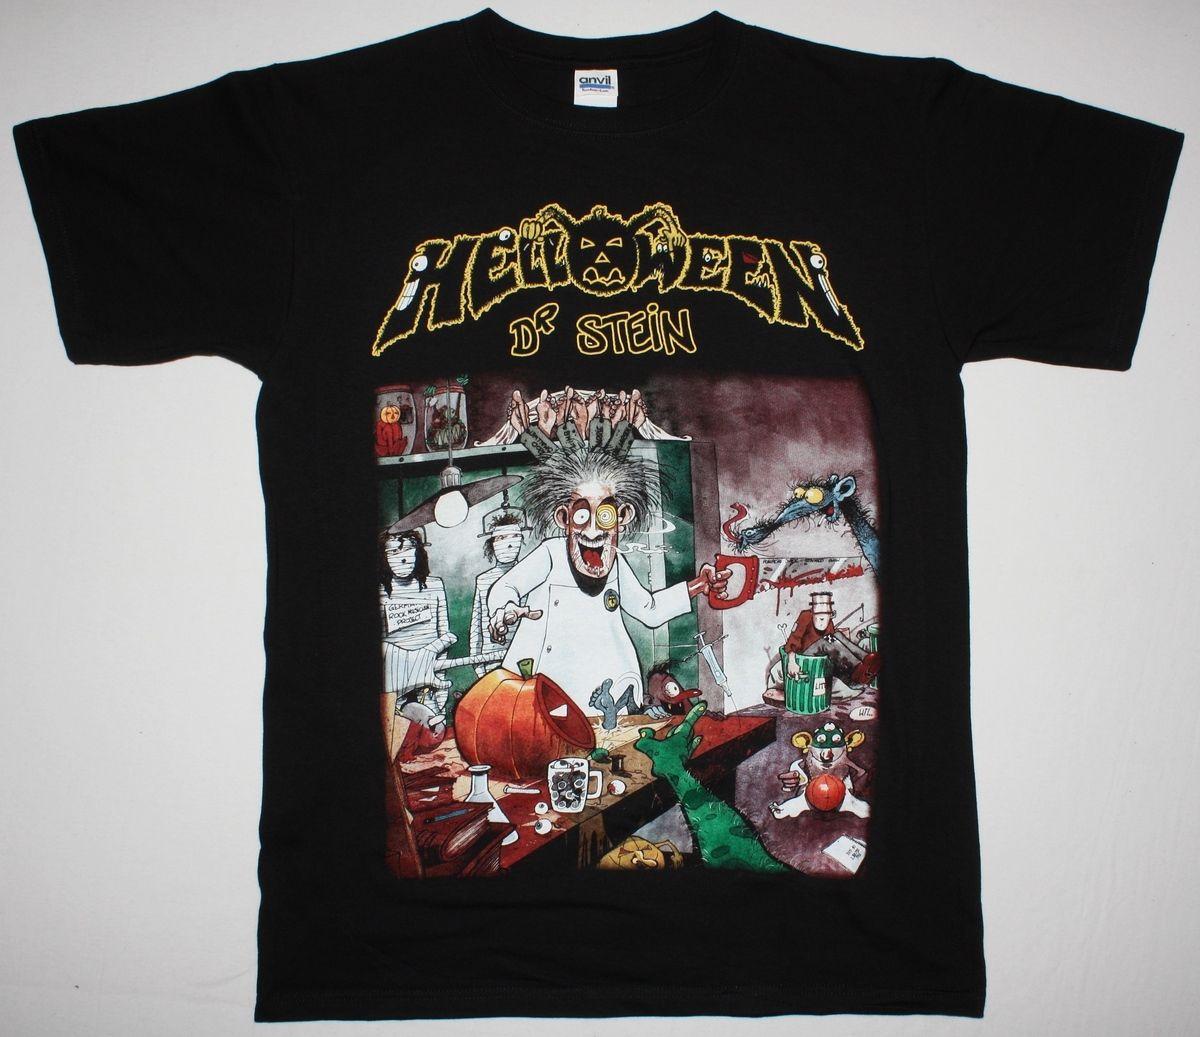 HELLOWEEN-Dr T-shirt-SIZES S to 7XL Stein-power metal-Gamma Ray-Stratovarius